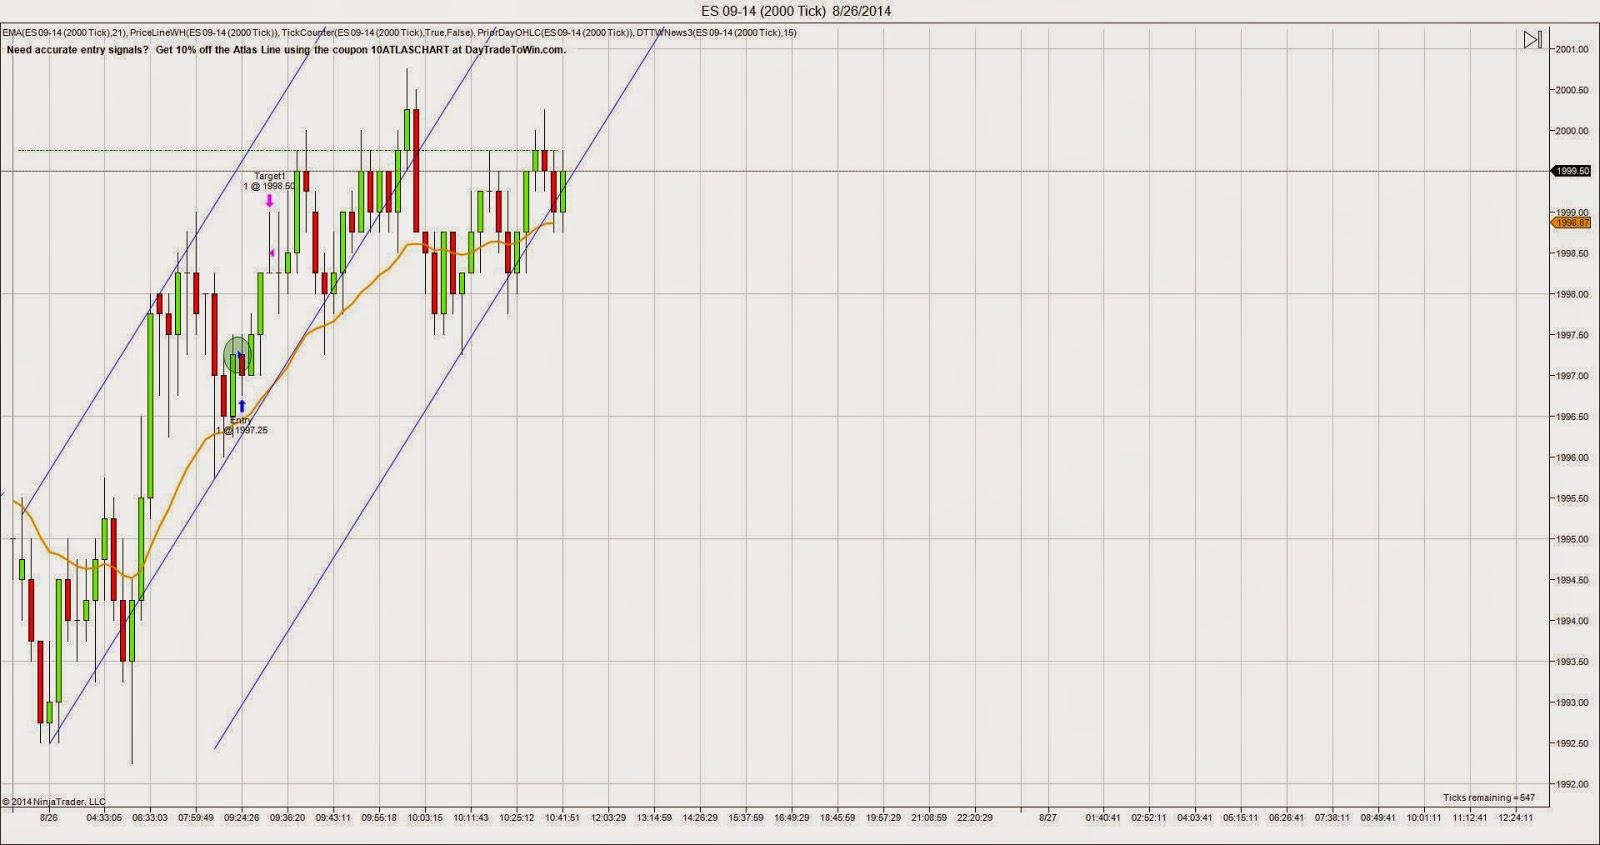 E-mini S&P 500 Futures chart for Tuesday 8/26/14